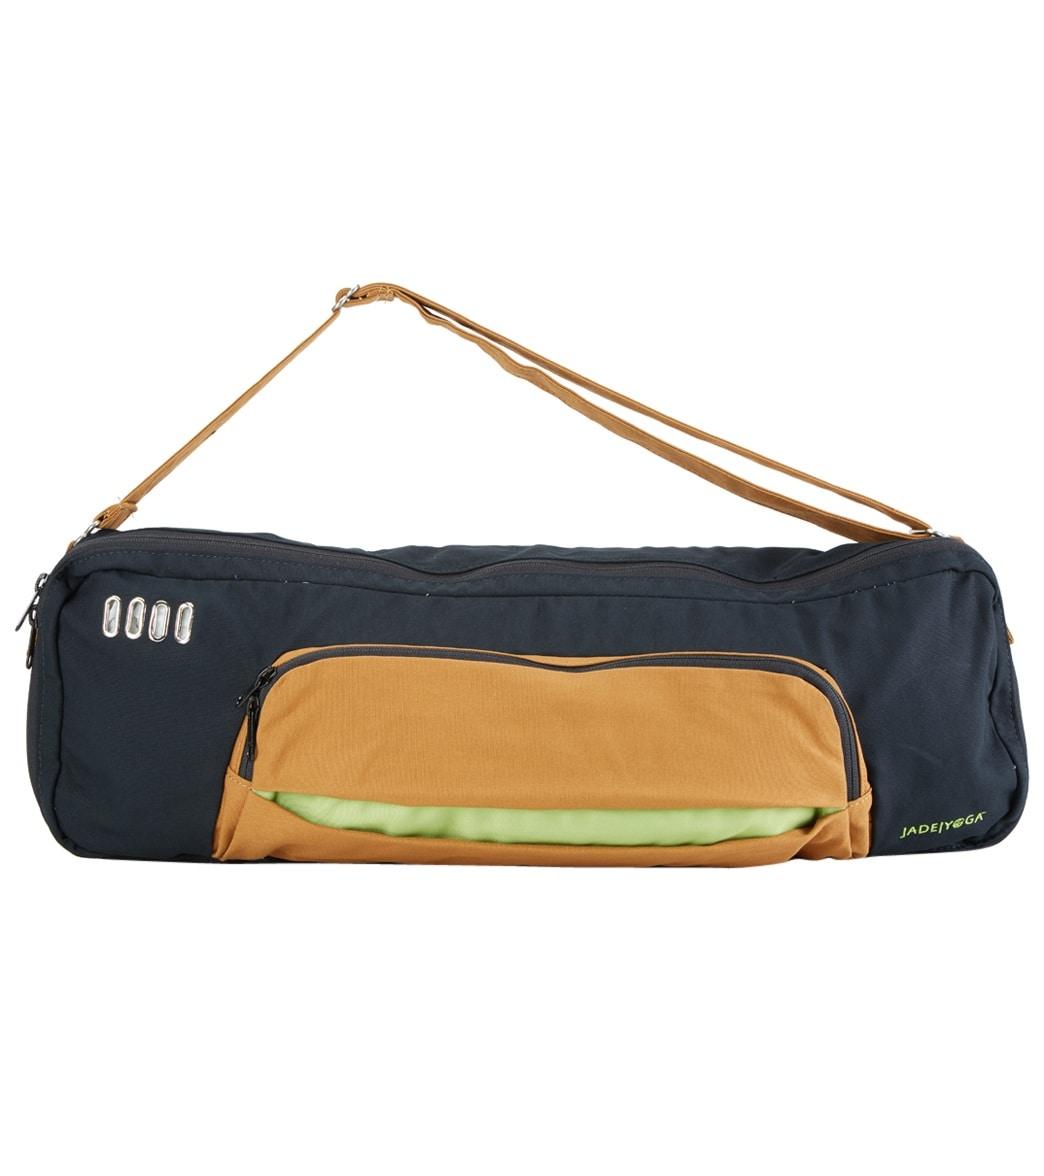 Jade Yoga Khaya Yoga Mat Bag at SwimOutlet.com - Free Shipping